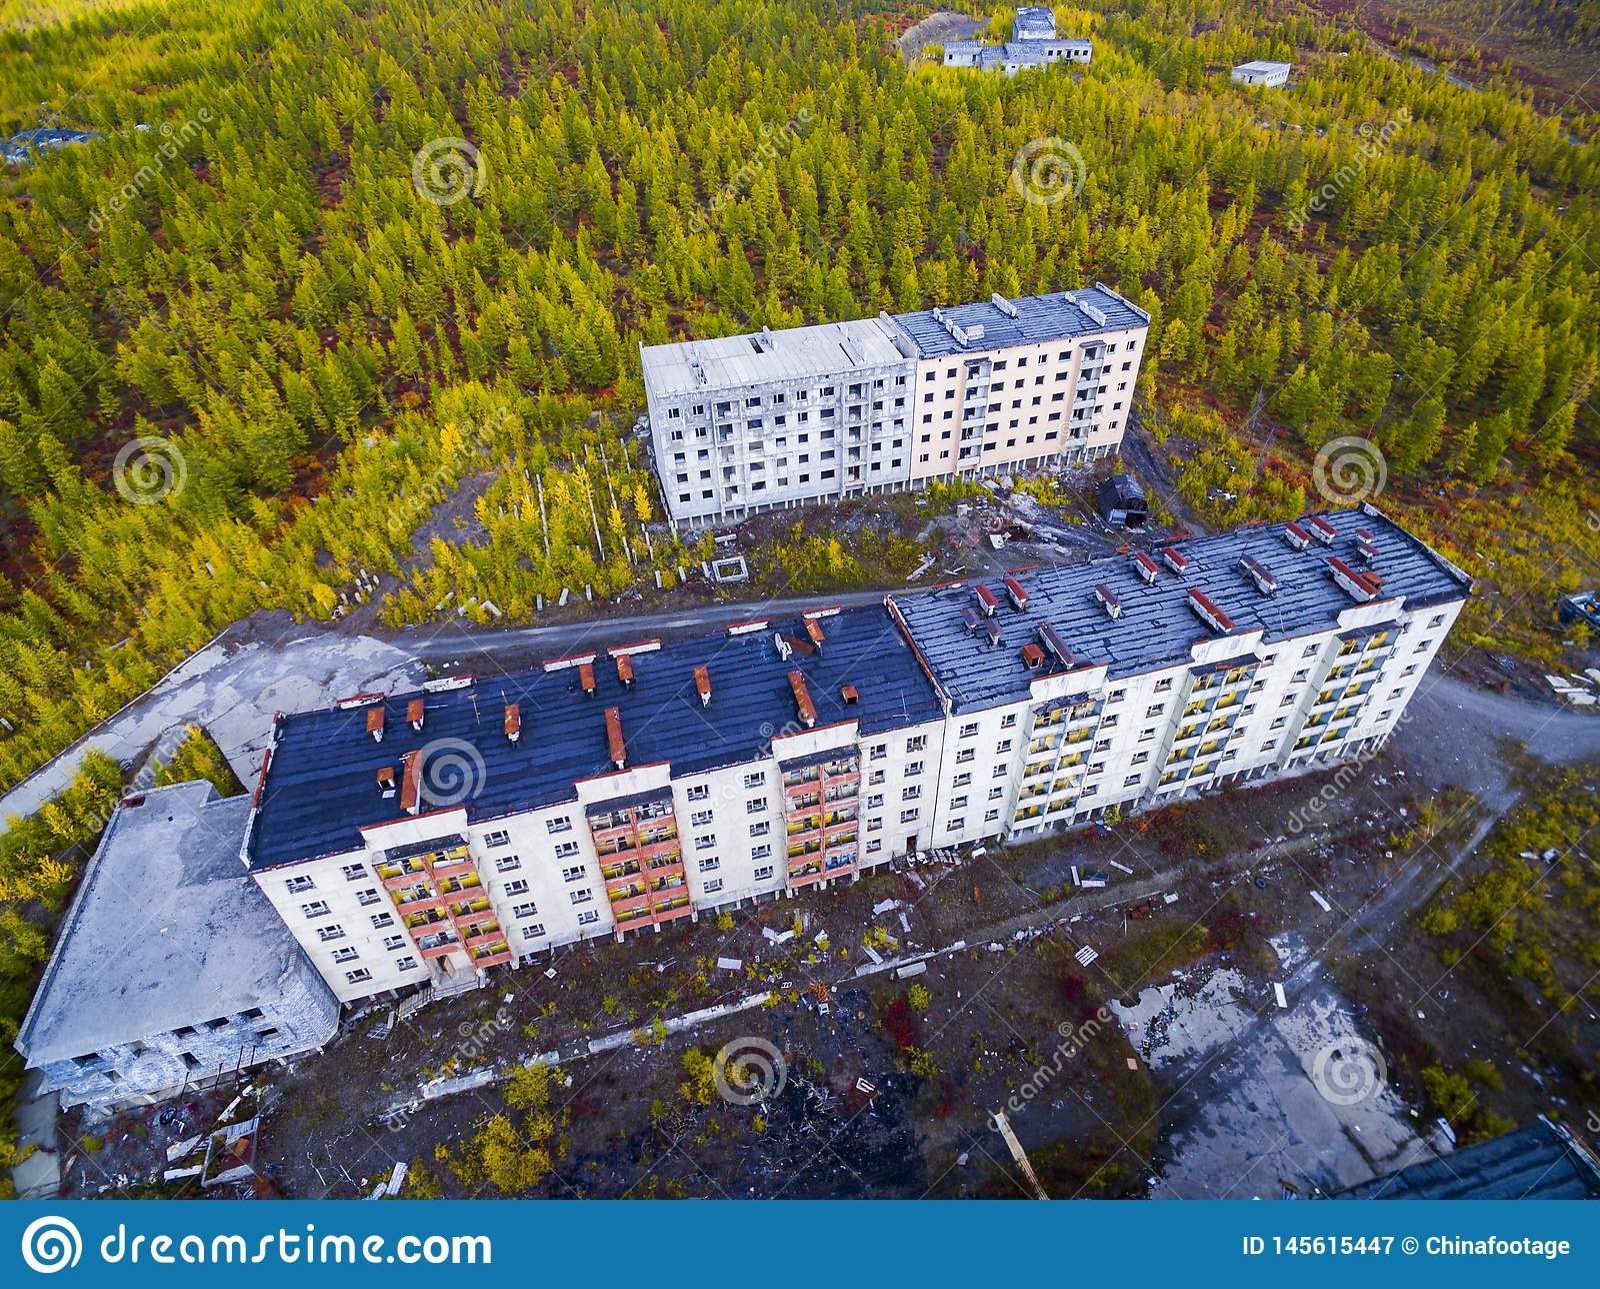 Aerial view of The ghost town Kadykchan, Kolyma, Magadan region